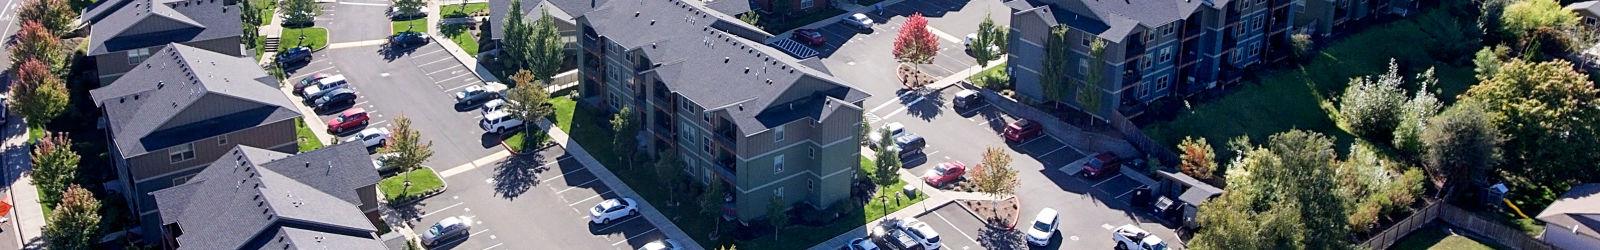 Reviews for Orchard Ridge in Salem, Oregon